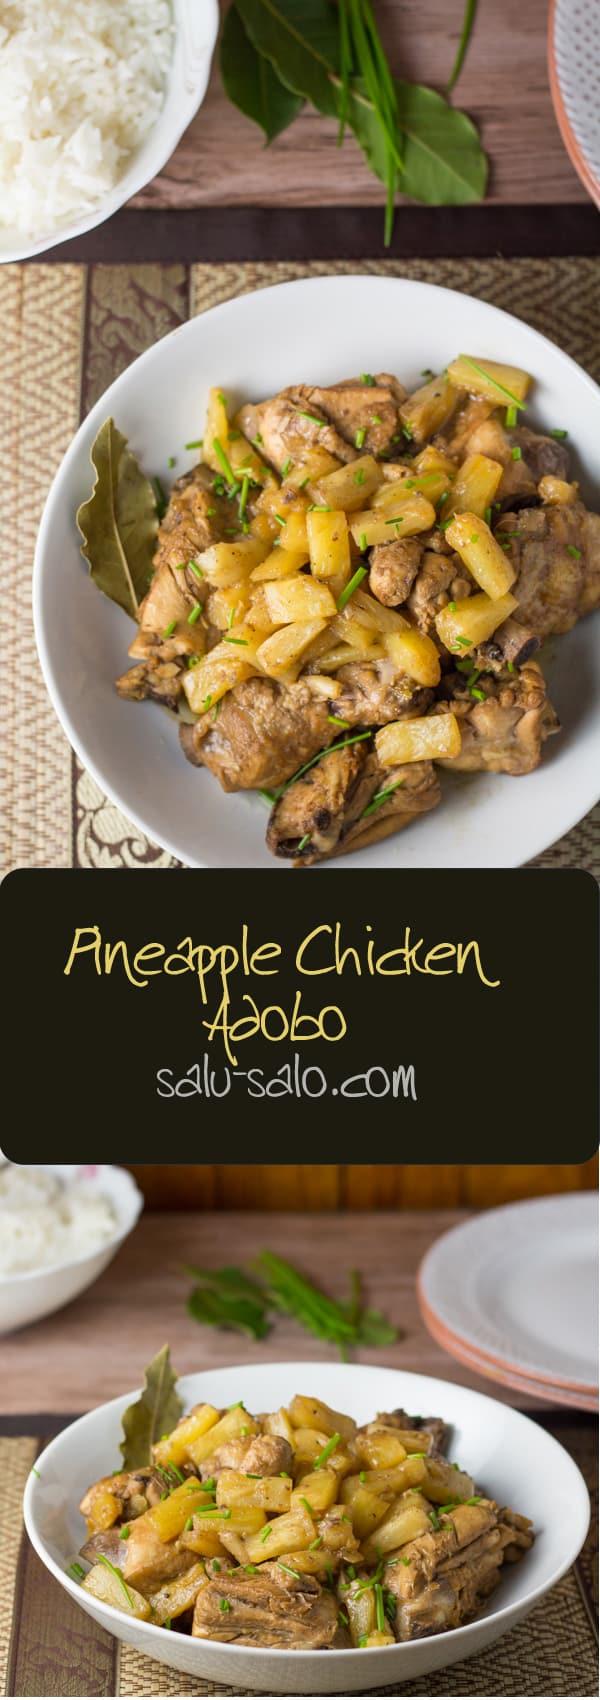 Pineapple Chicken Adobo